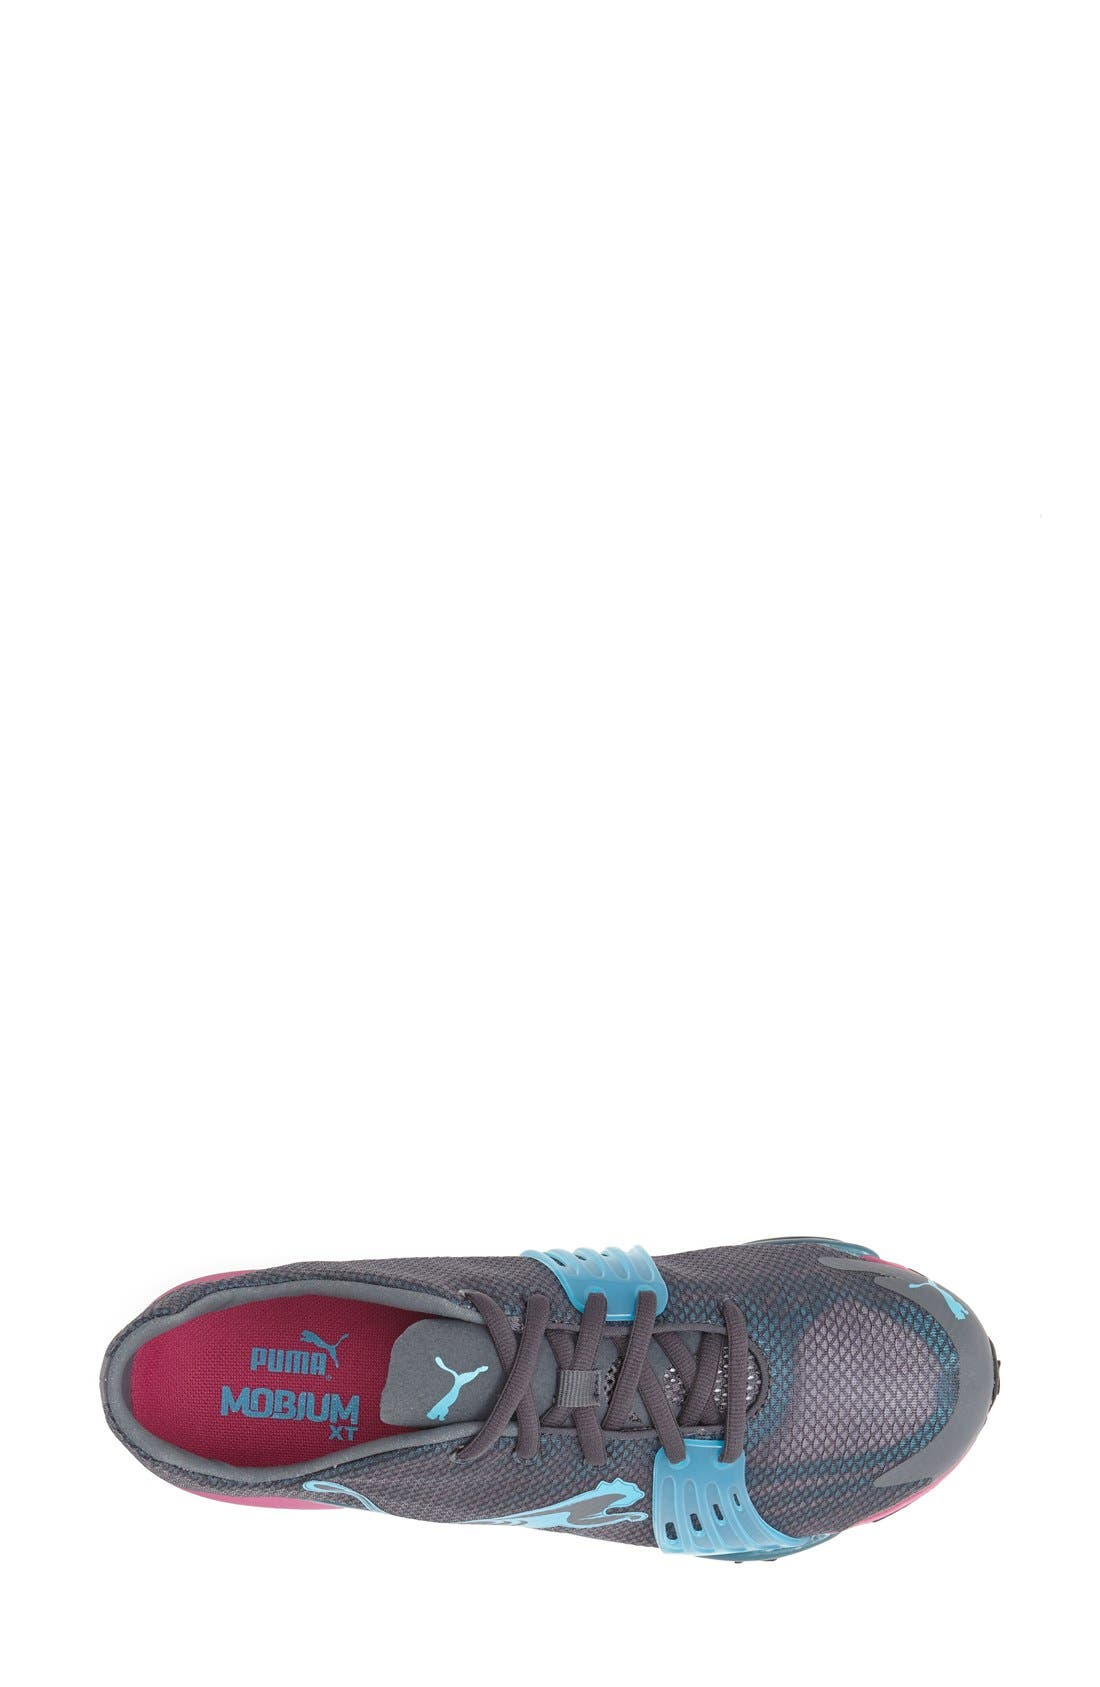 Alternate Image 3  - PUMA 'Mobium XT' Training Shoe (Women)